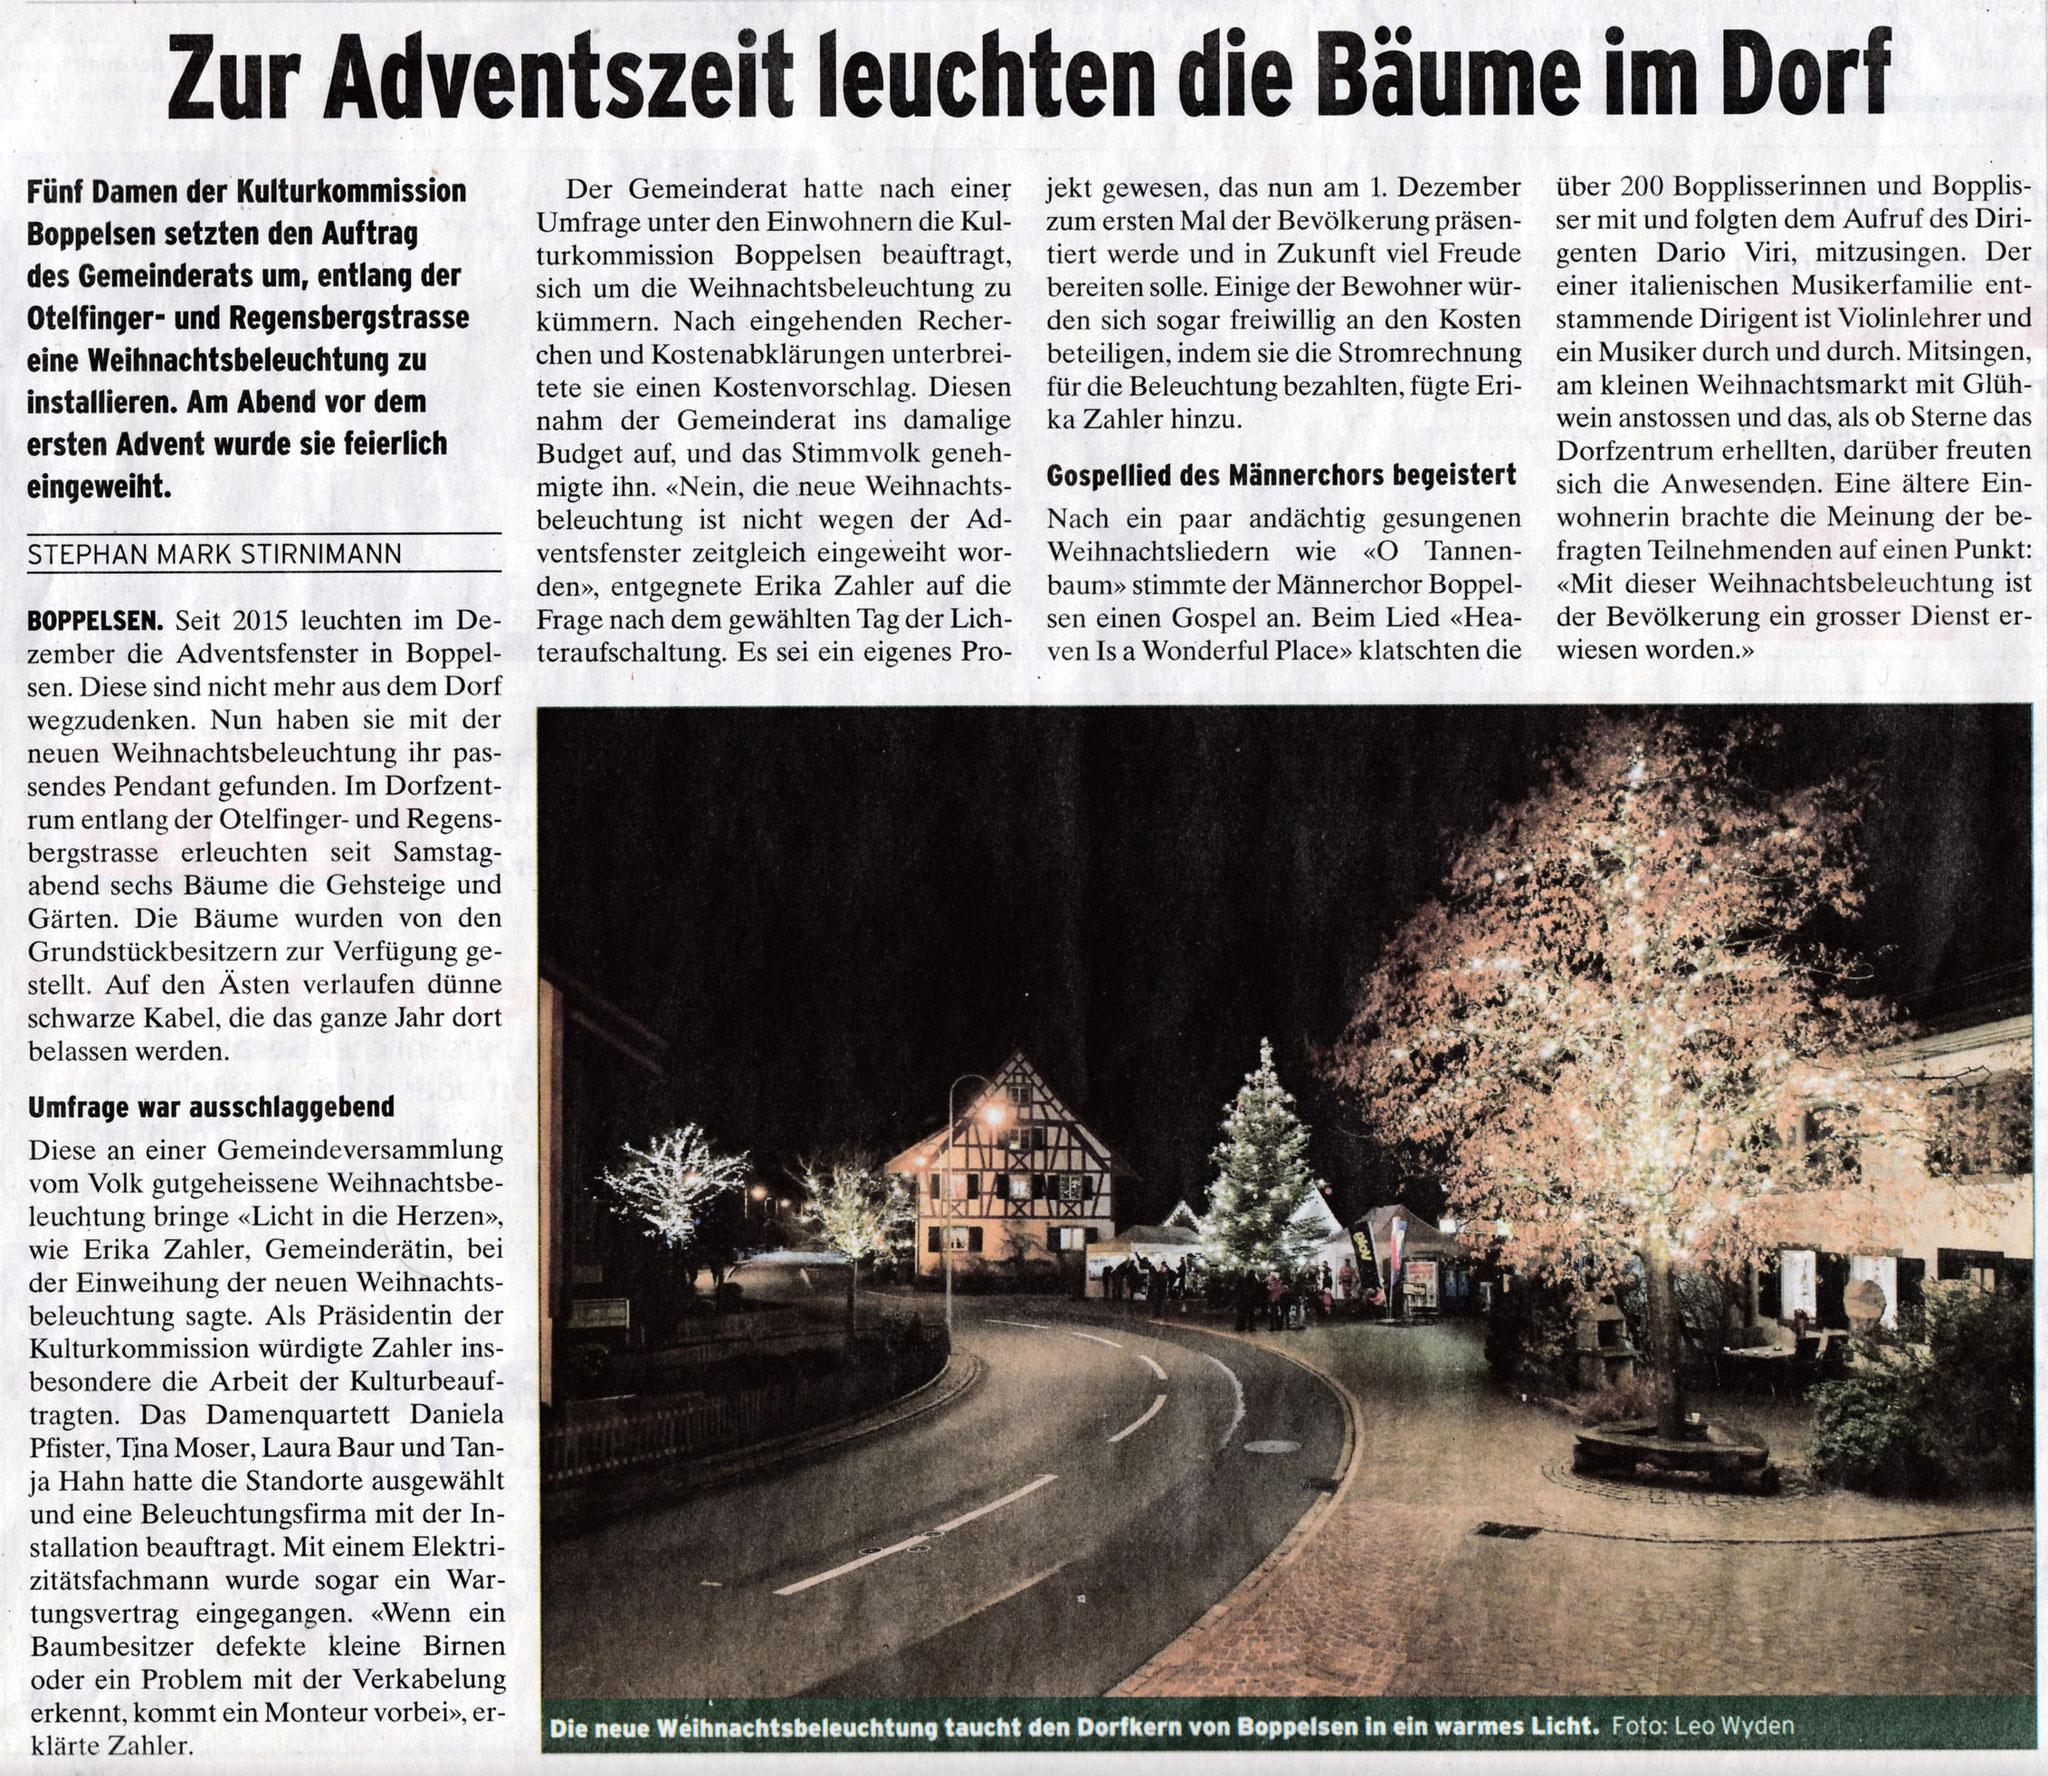 Dorfplatz am 1. Advent::1.12.2018